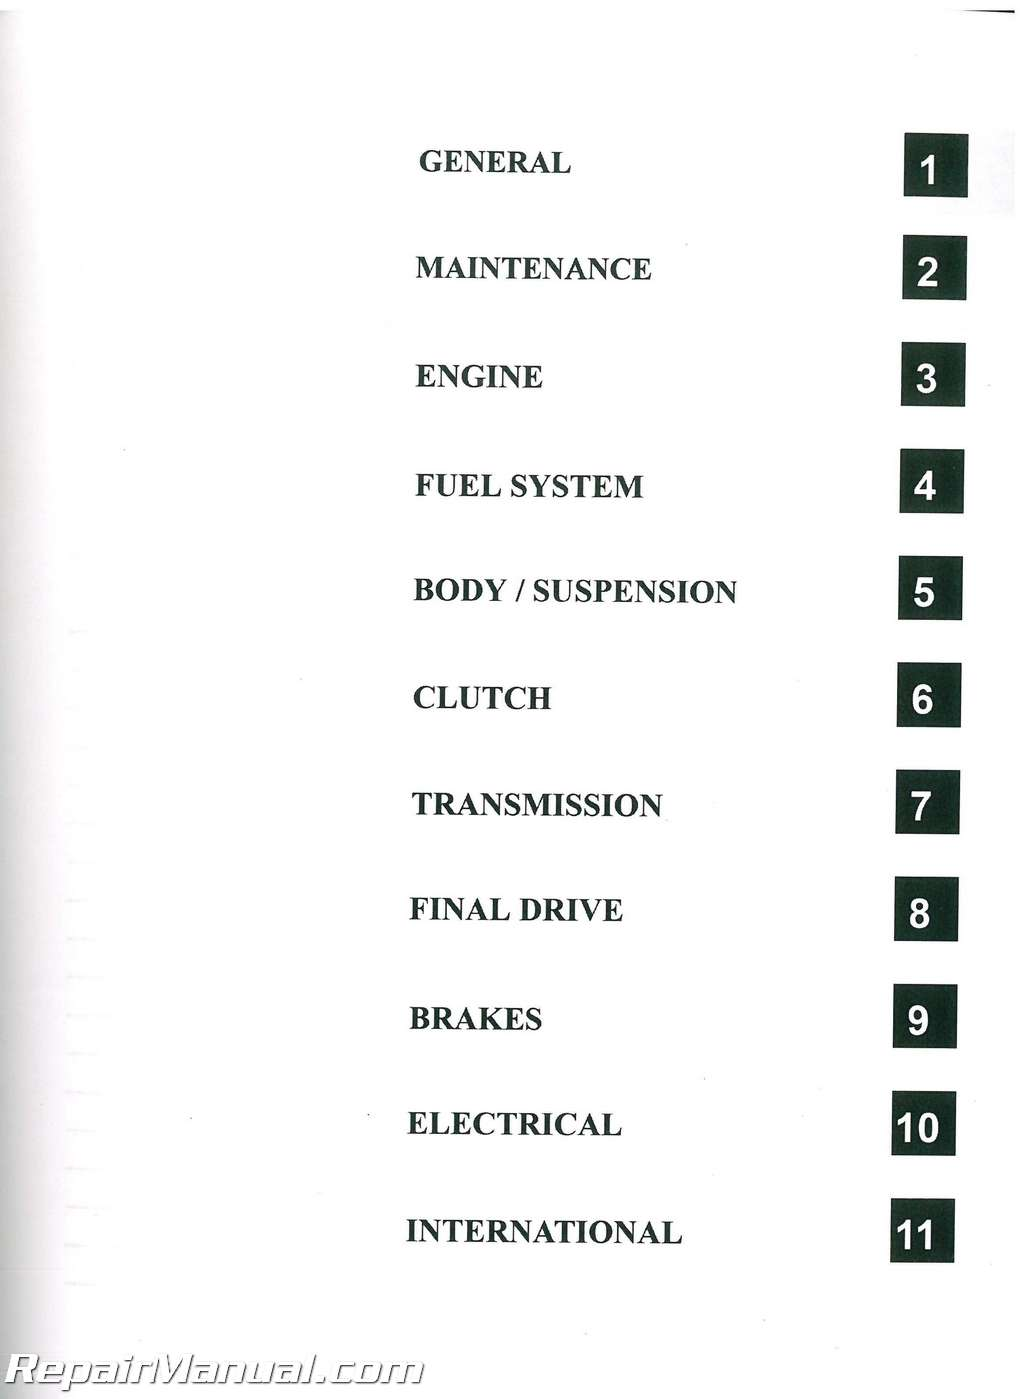 hight resolution of 2008 polaris sportsman 500 efi x2 touring h o atv service manual rh repairmanual com 2005 polaris 2007 polaris sportsman 500 adc wiring diagram